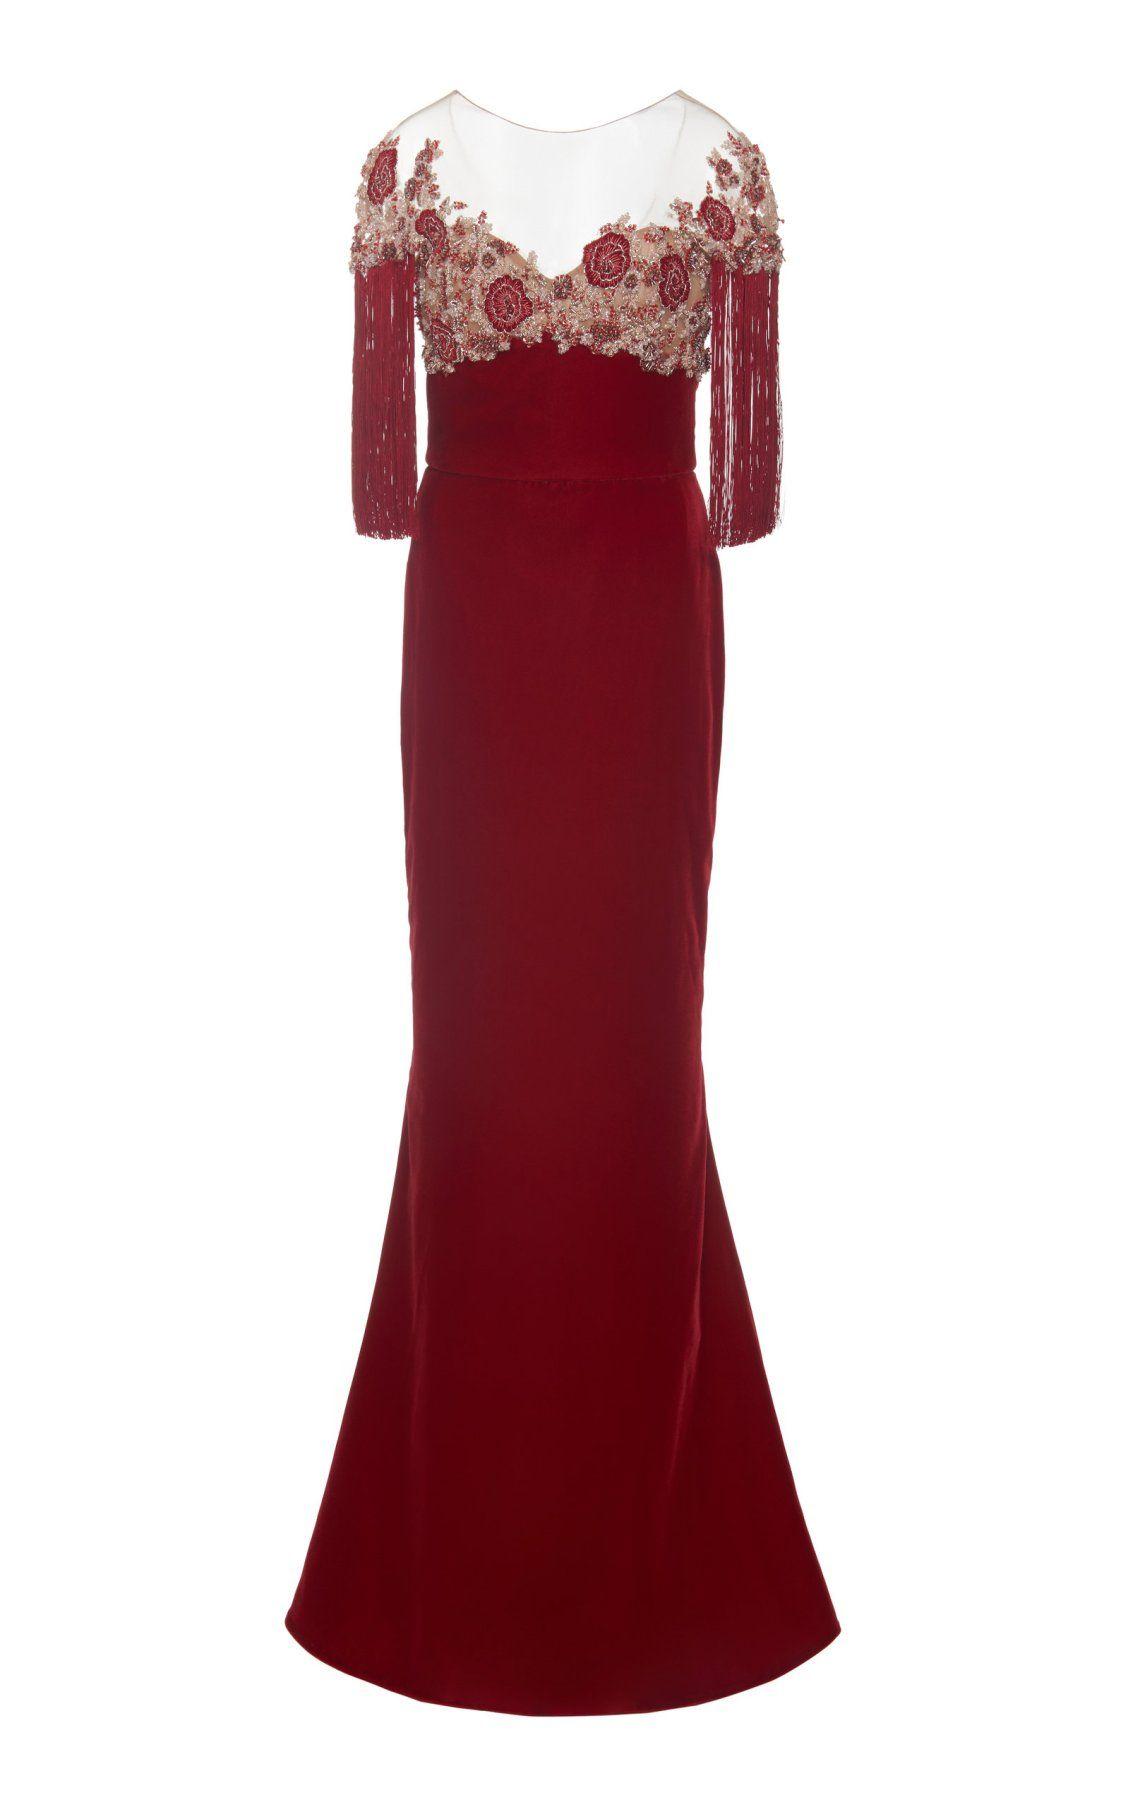 2acac7fd96 Embroidered Velvet Column Gown by Marchesa PF19   Moda Operandi   M ...